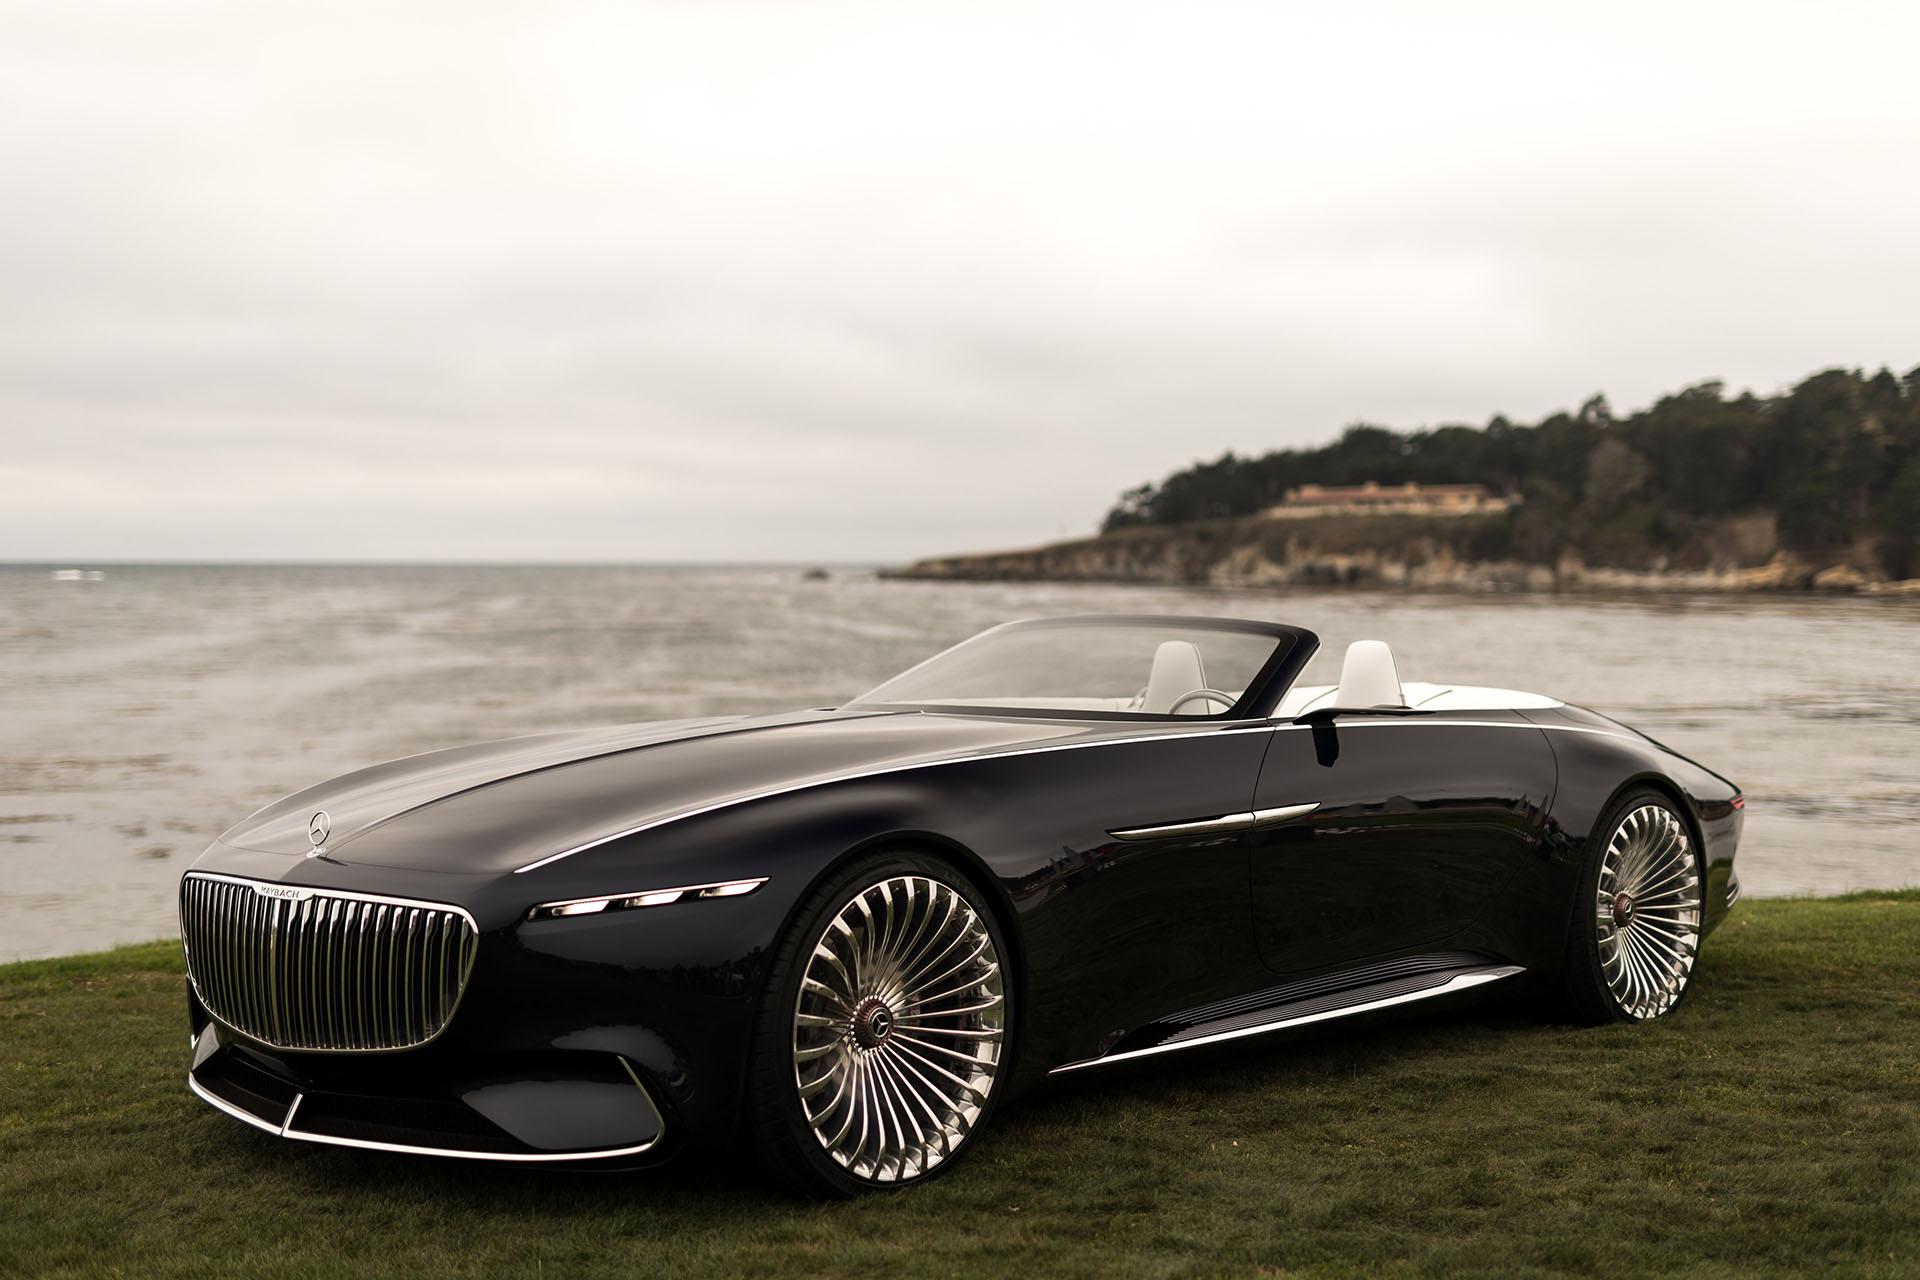 Mercedes Maybach Concept Model Car